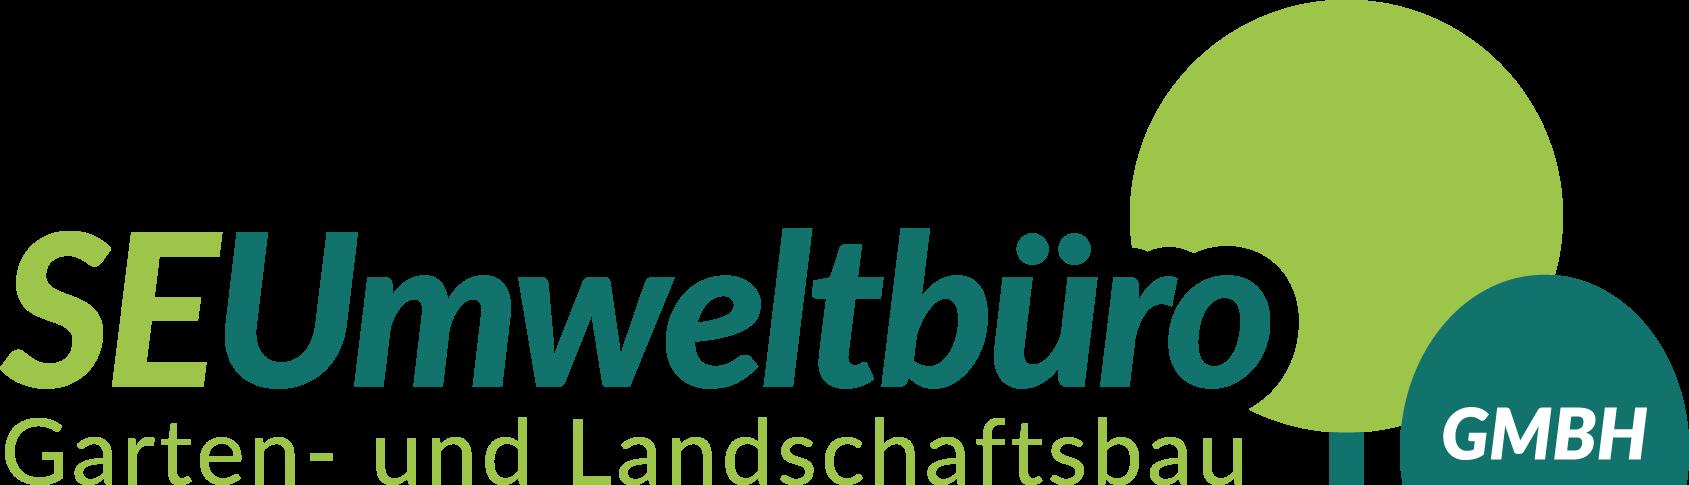 SE-Umweltbüro GmbH